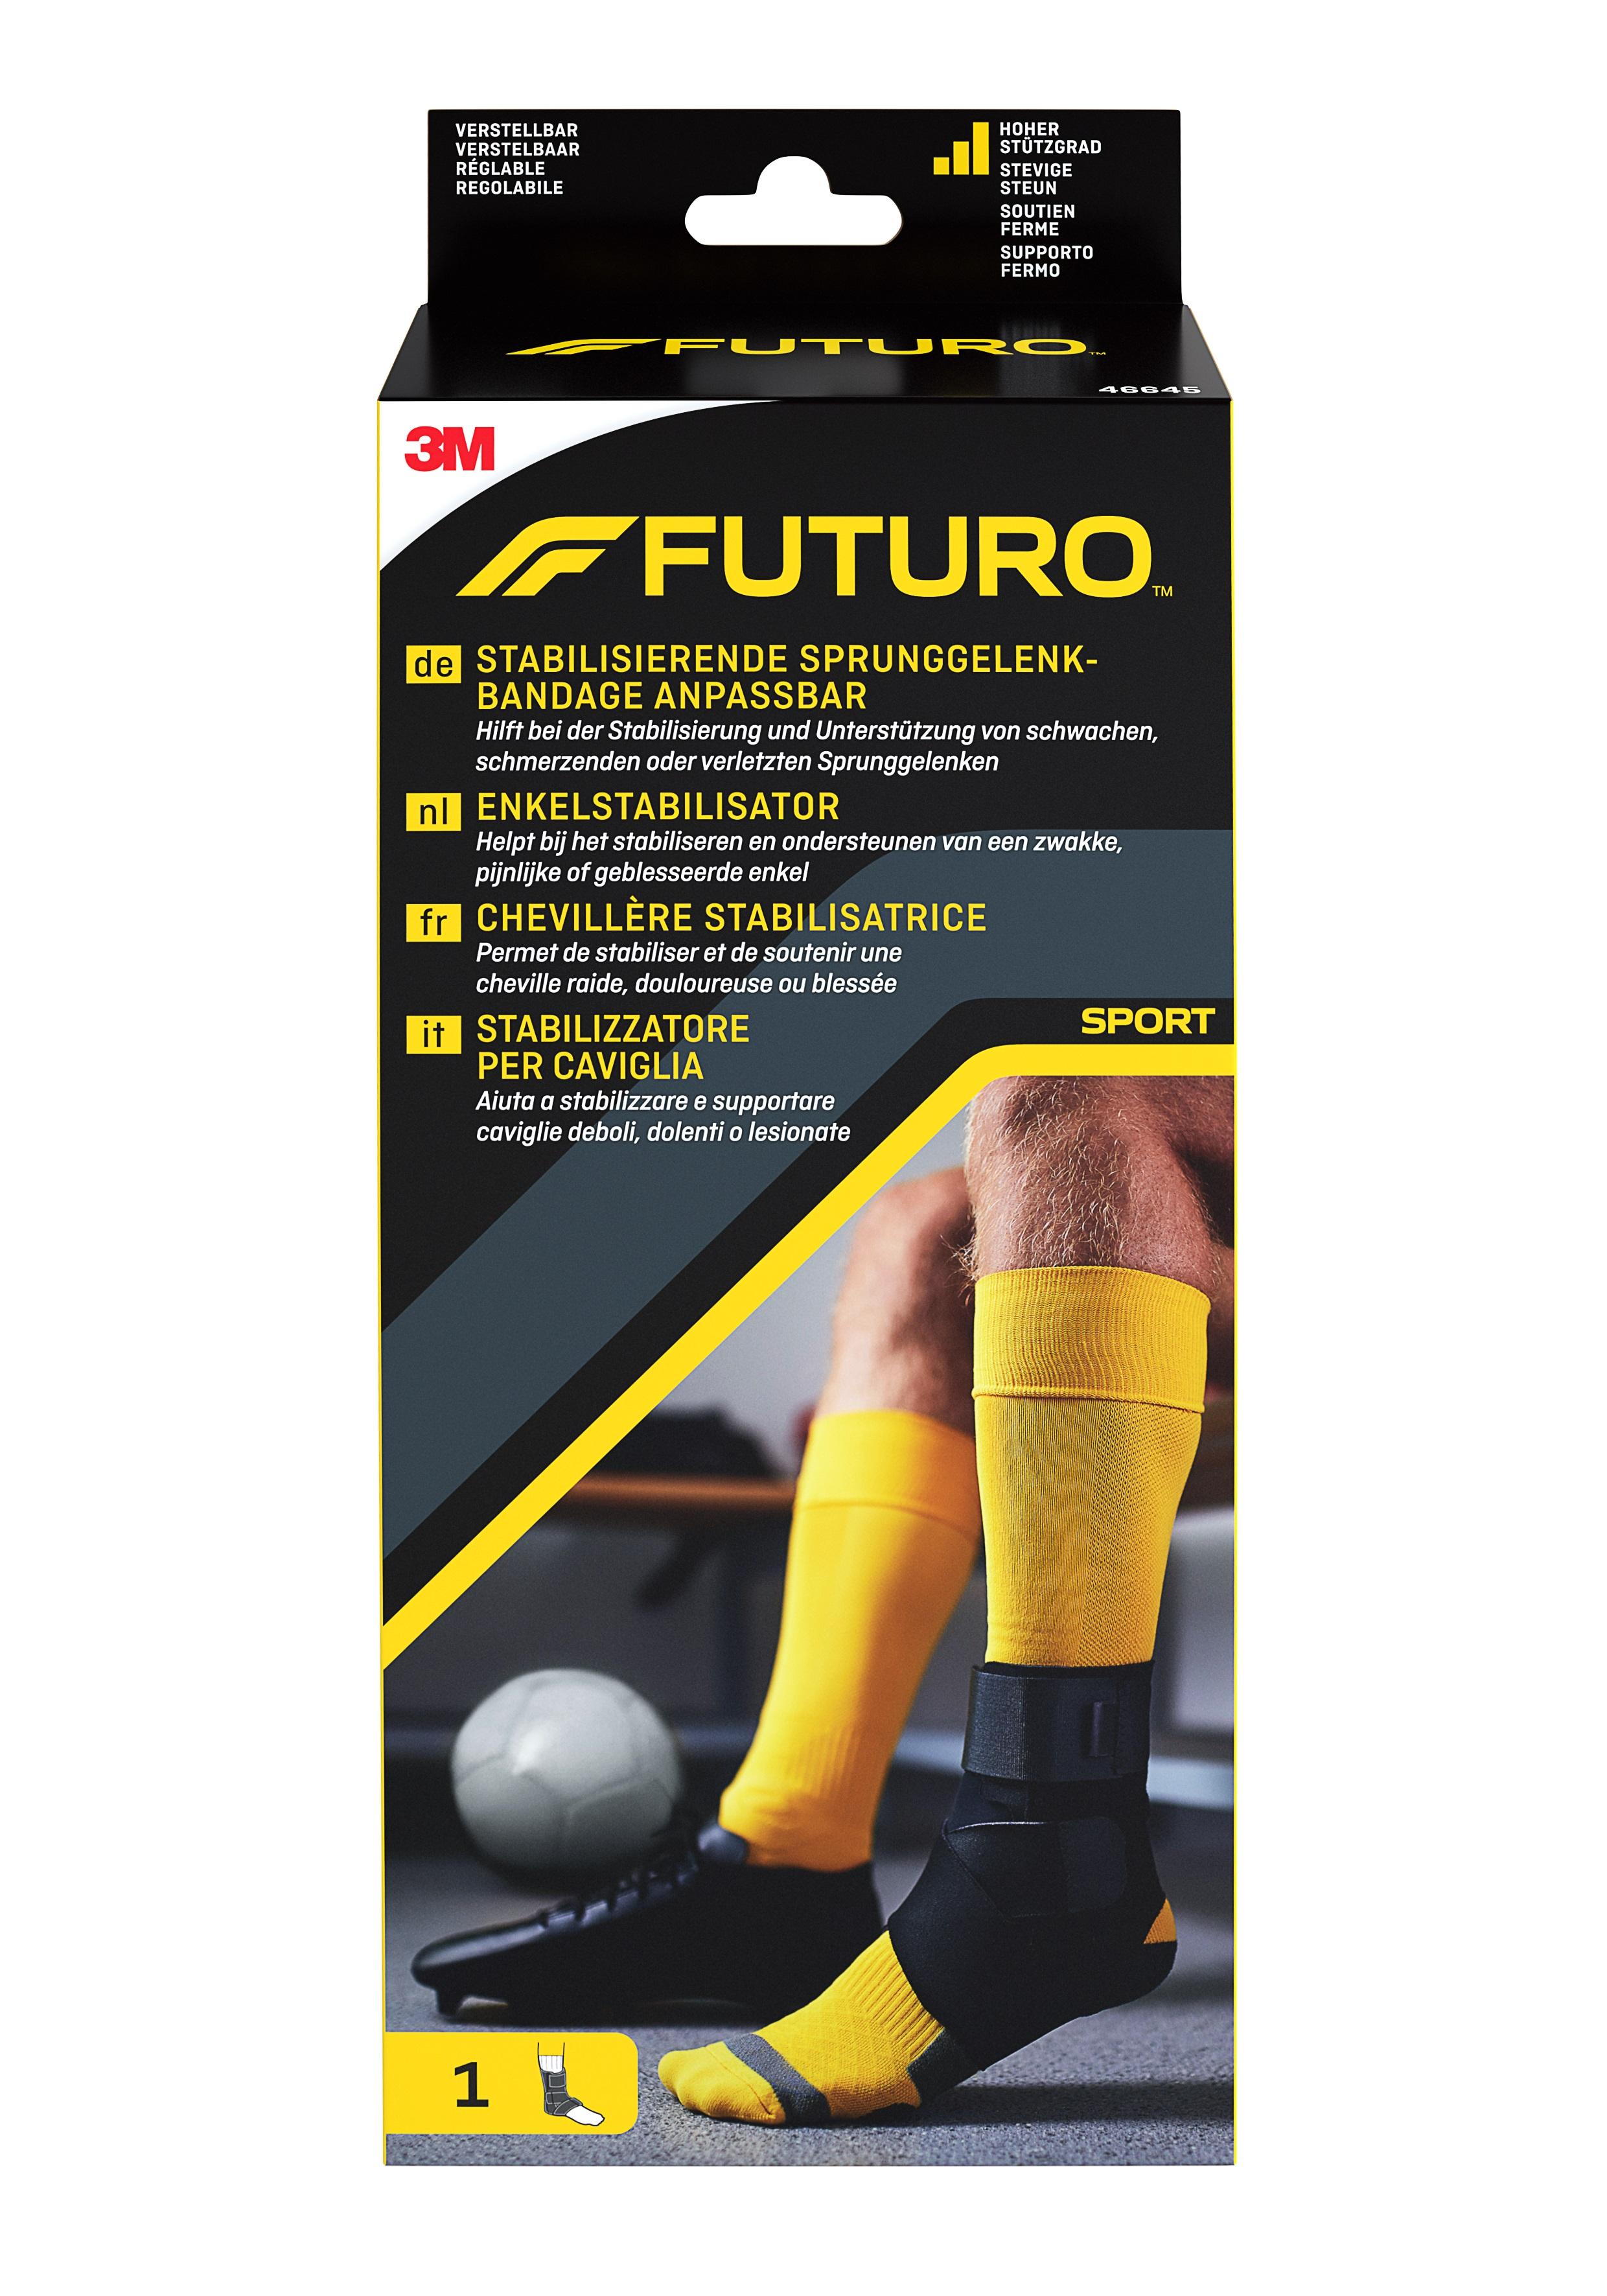 FUTURO™ Stabilisierende Sprunggelenk-Bandage anpassbar